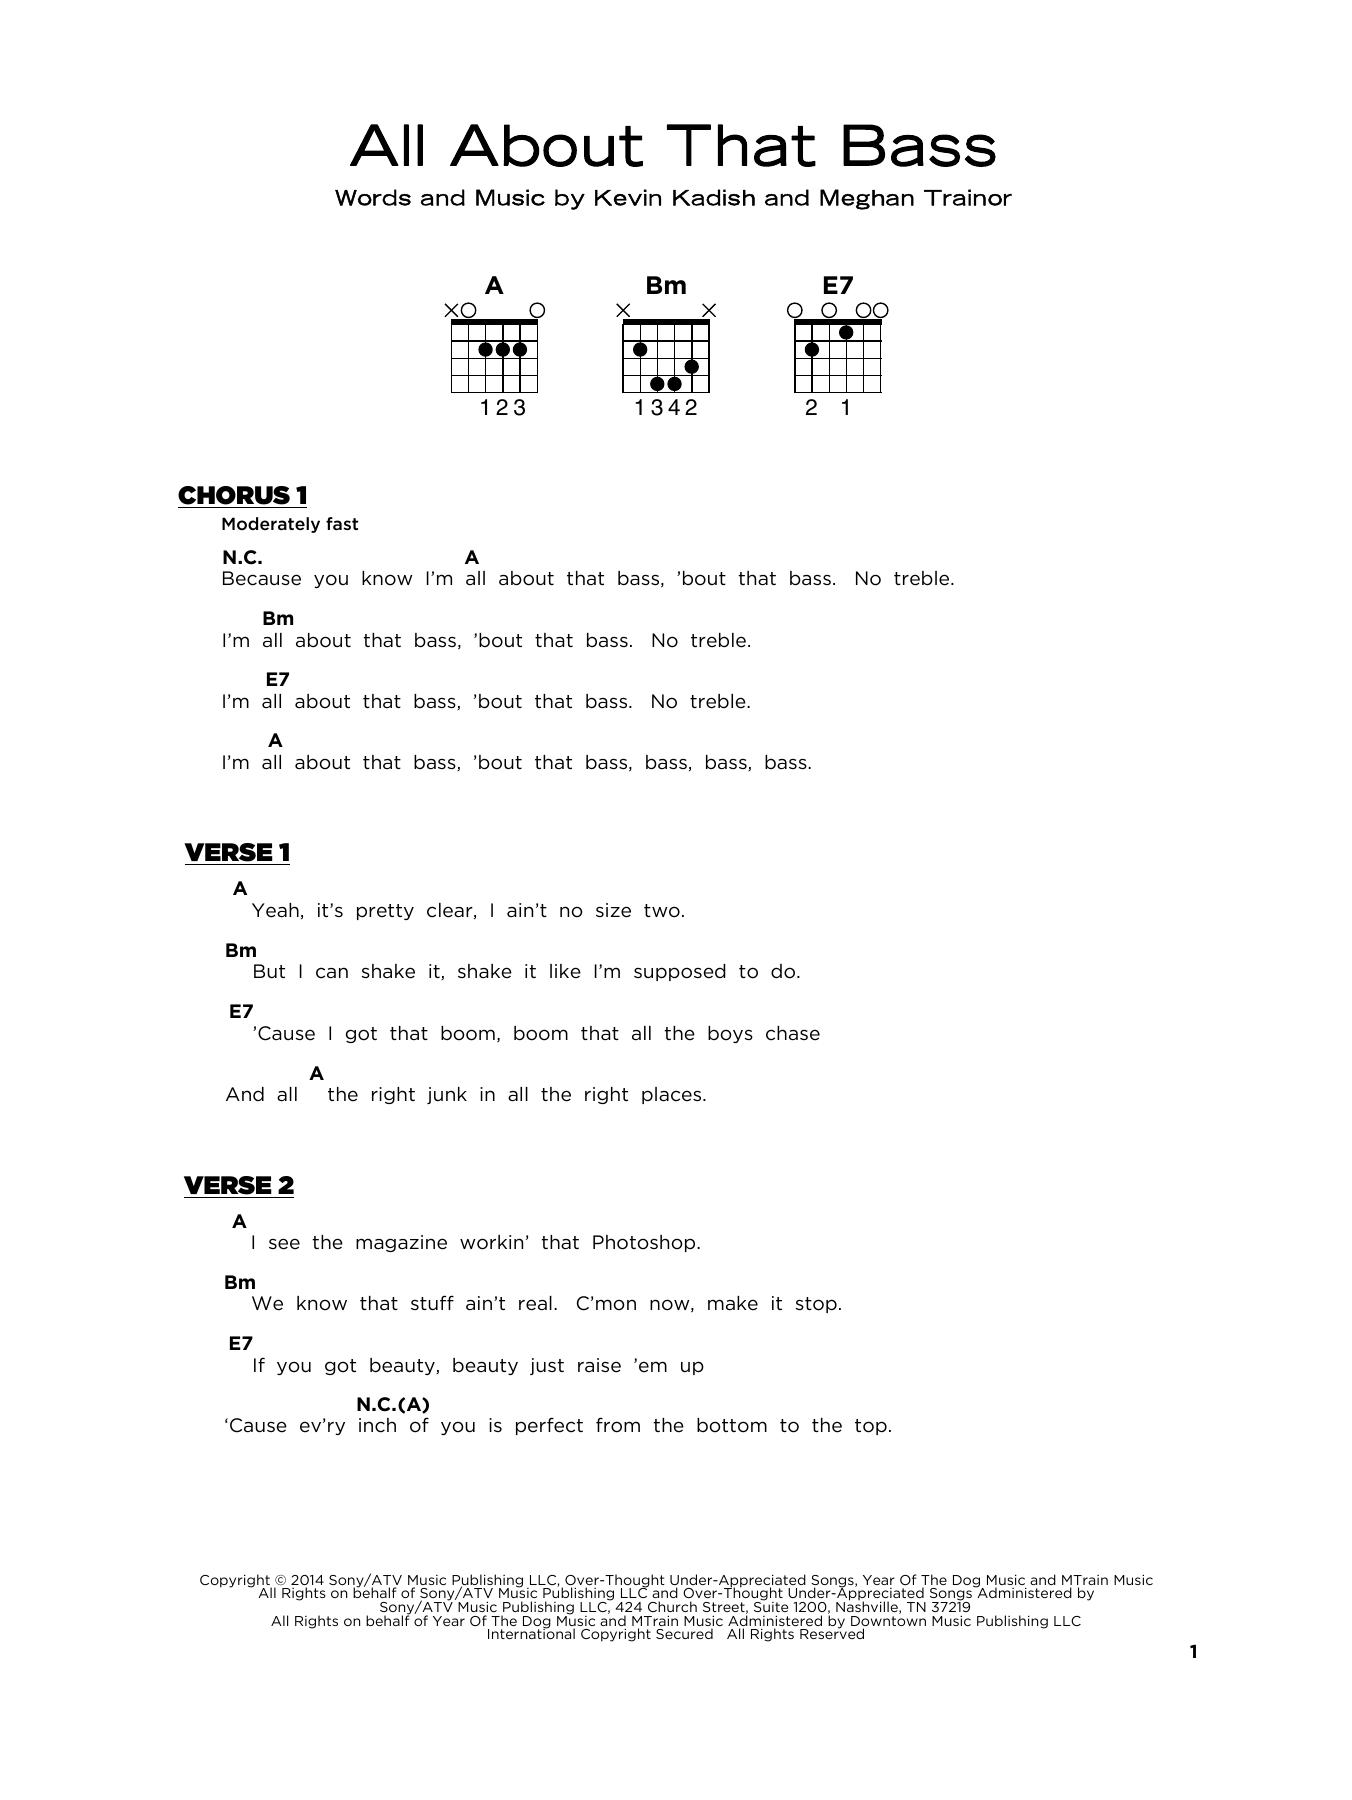 All About That Bass Sheet Music